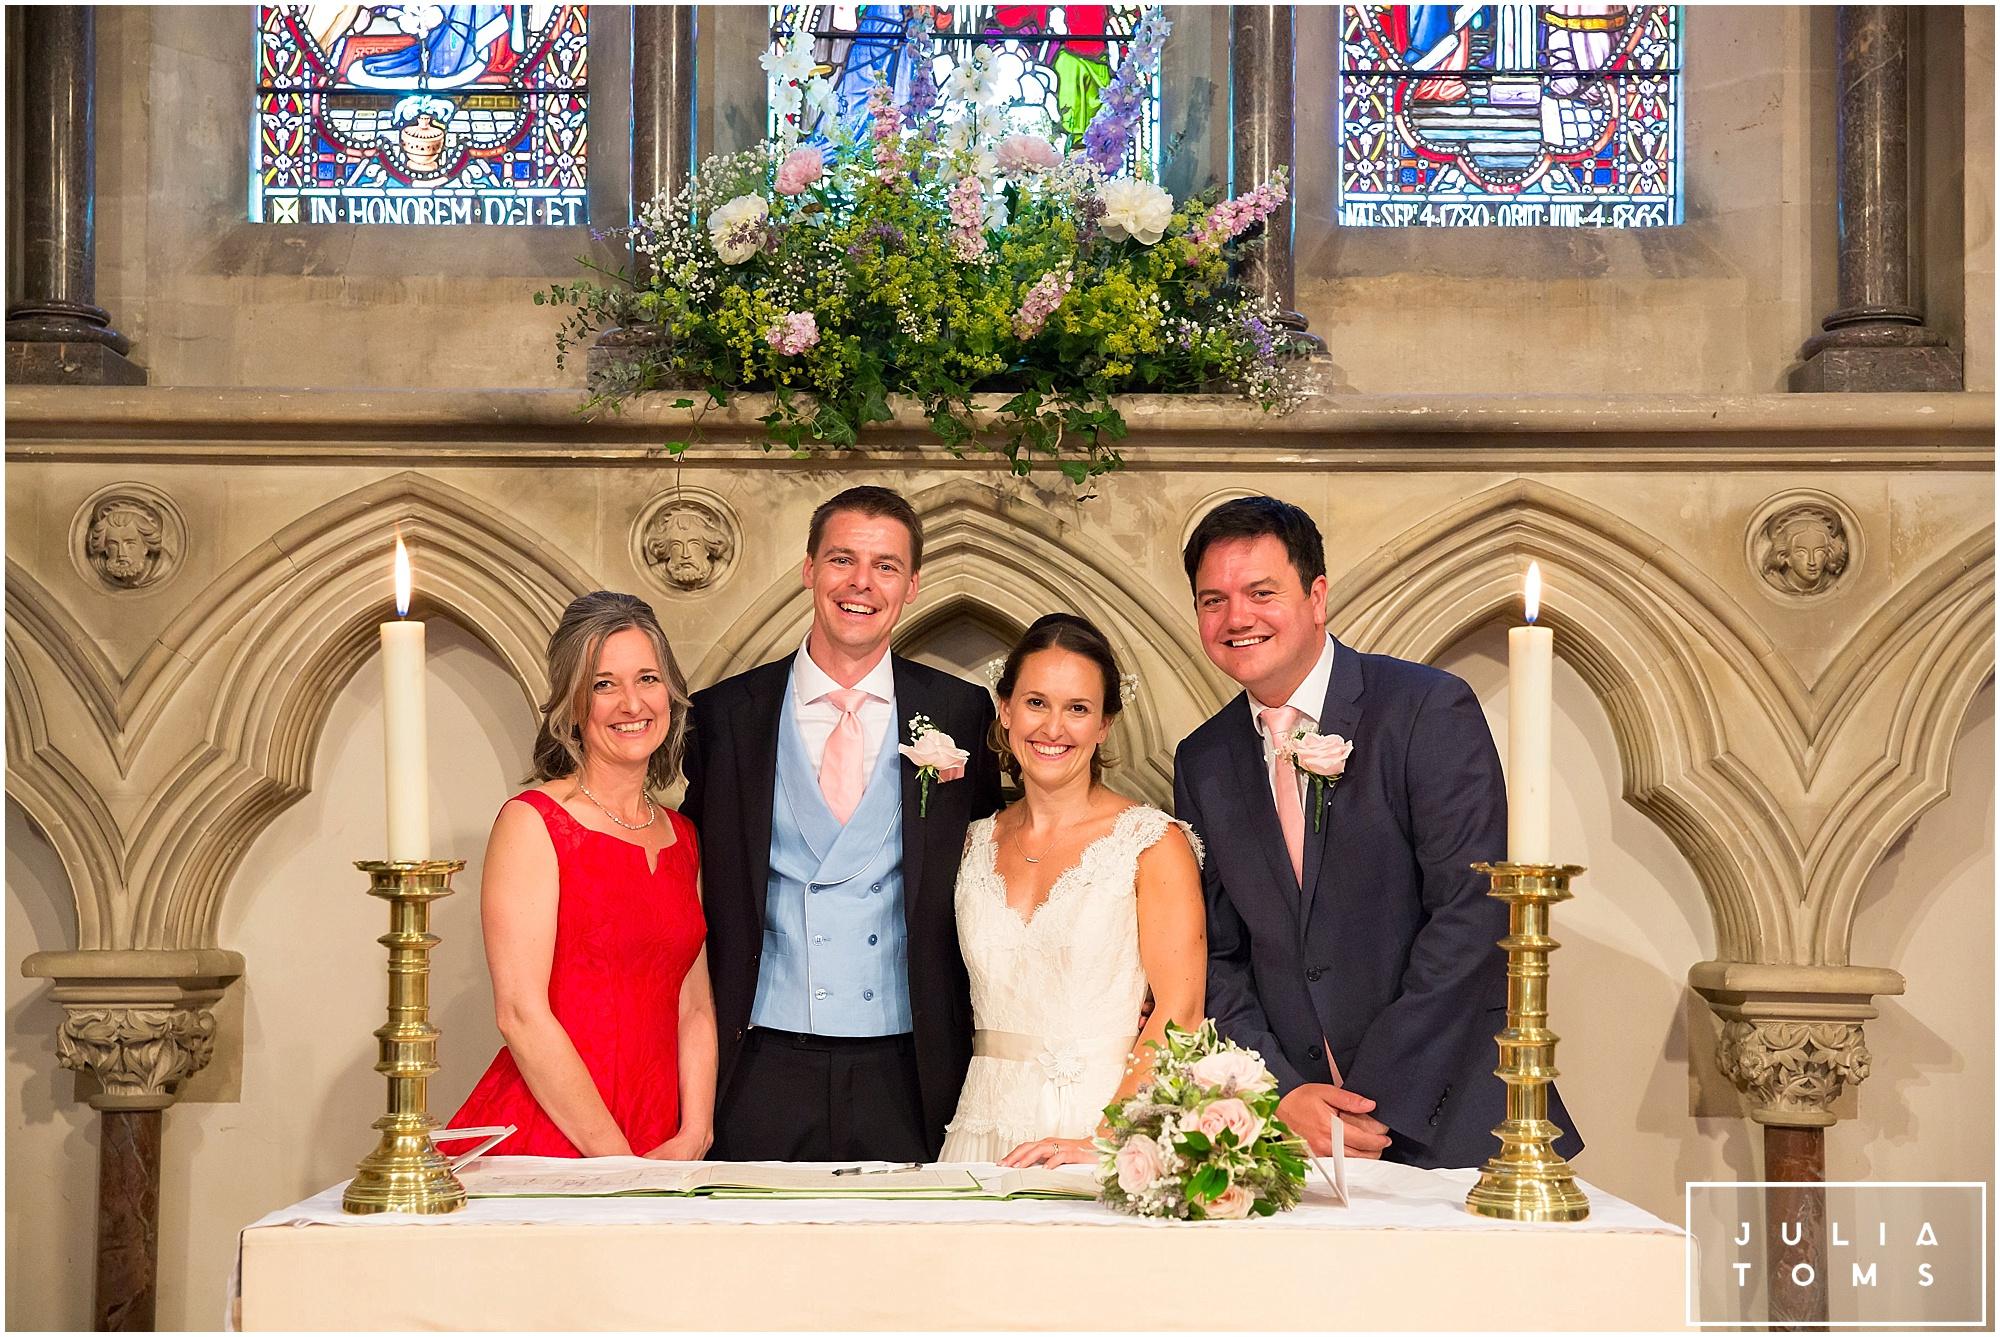 julia_toms_chichester_wedding_photographer_portsmouth_031.jpg